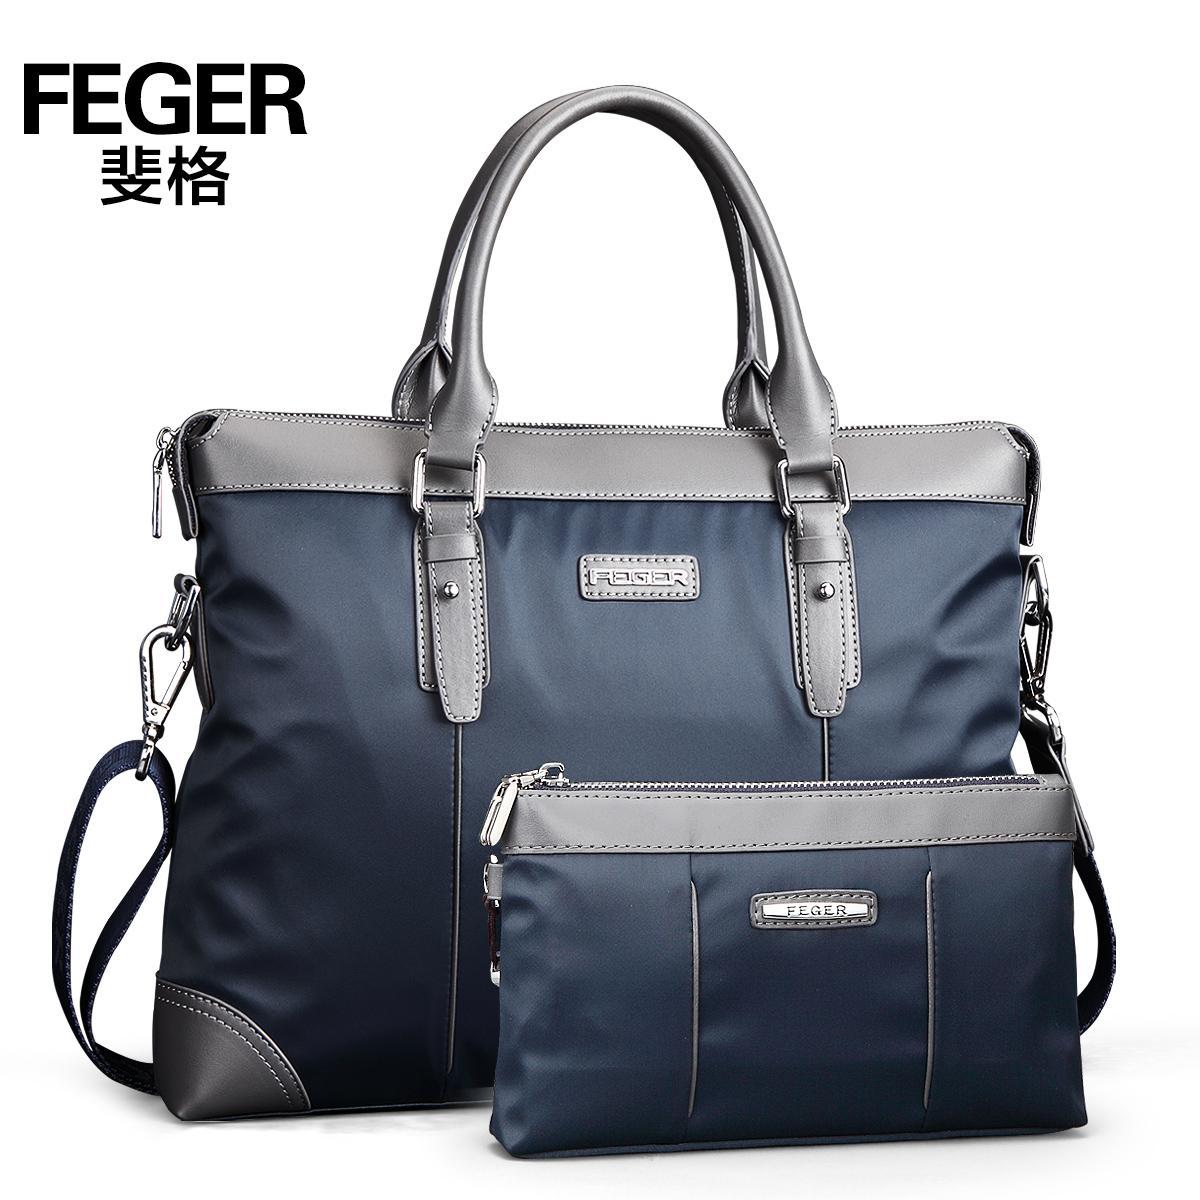 Handbag Men Cross Business Briefcase Computer Backpack Package Leisure Oxford  Cloth Shoulder bag bags Men s bag 2e3cc1587e8e6